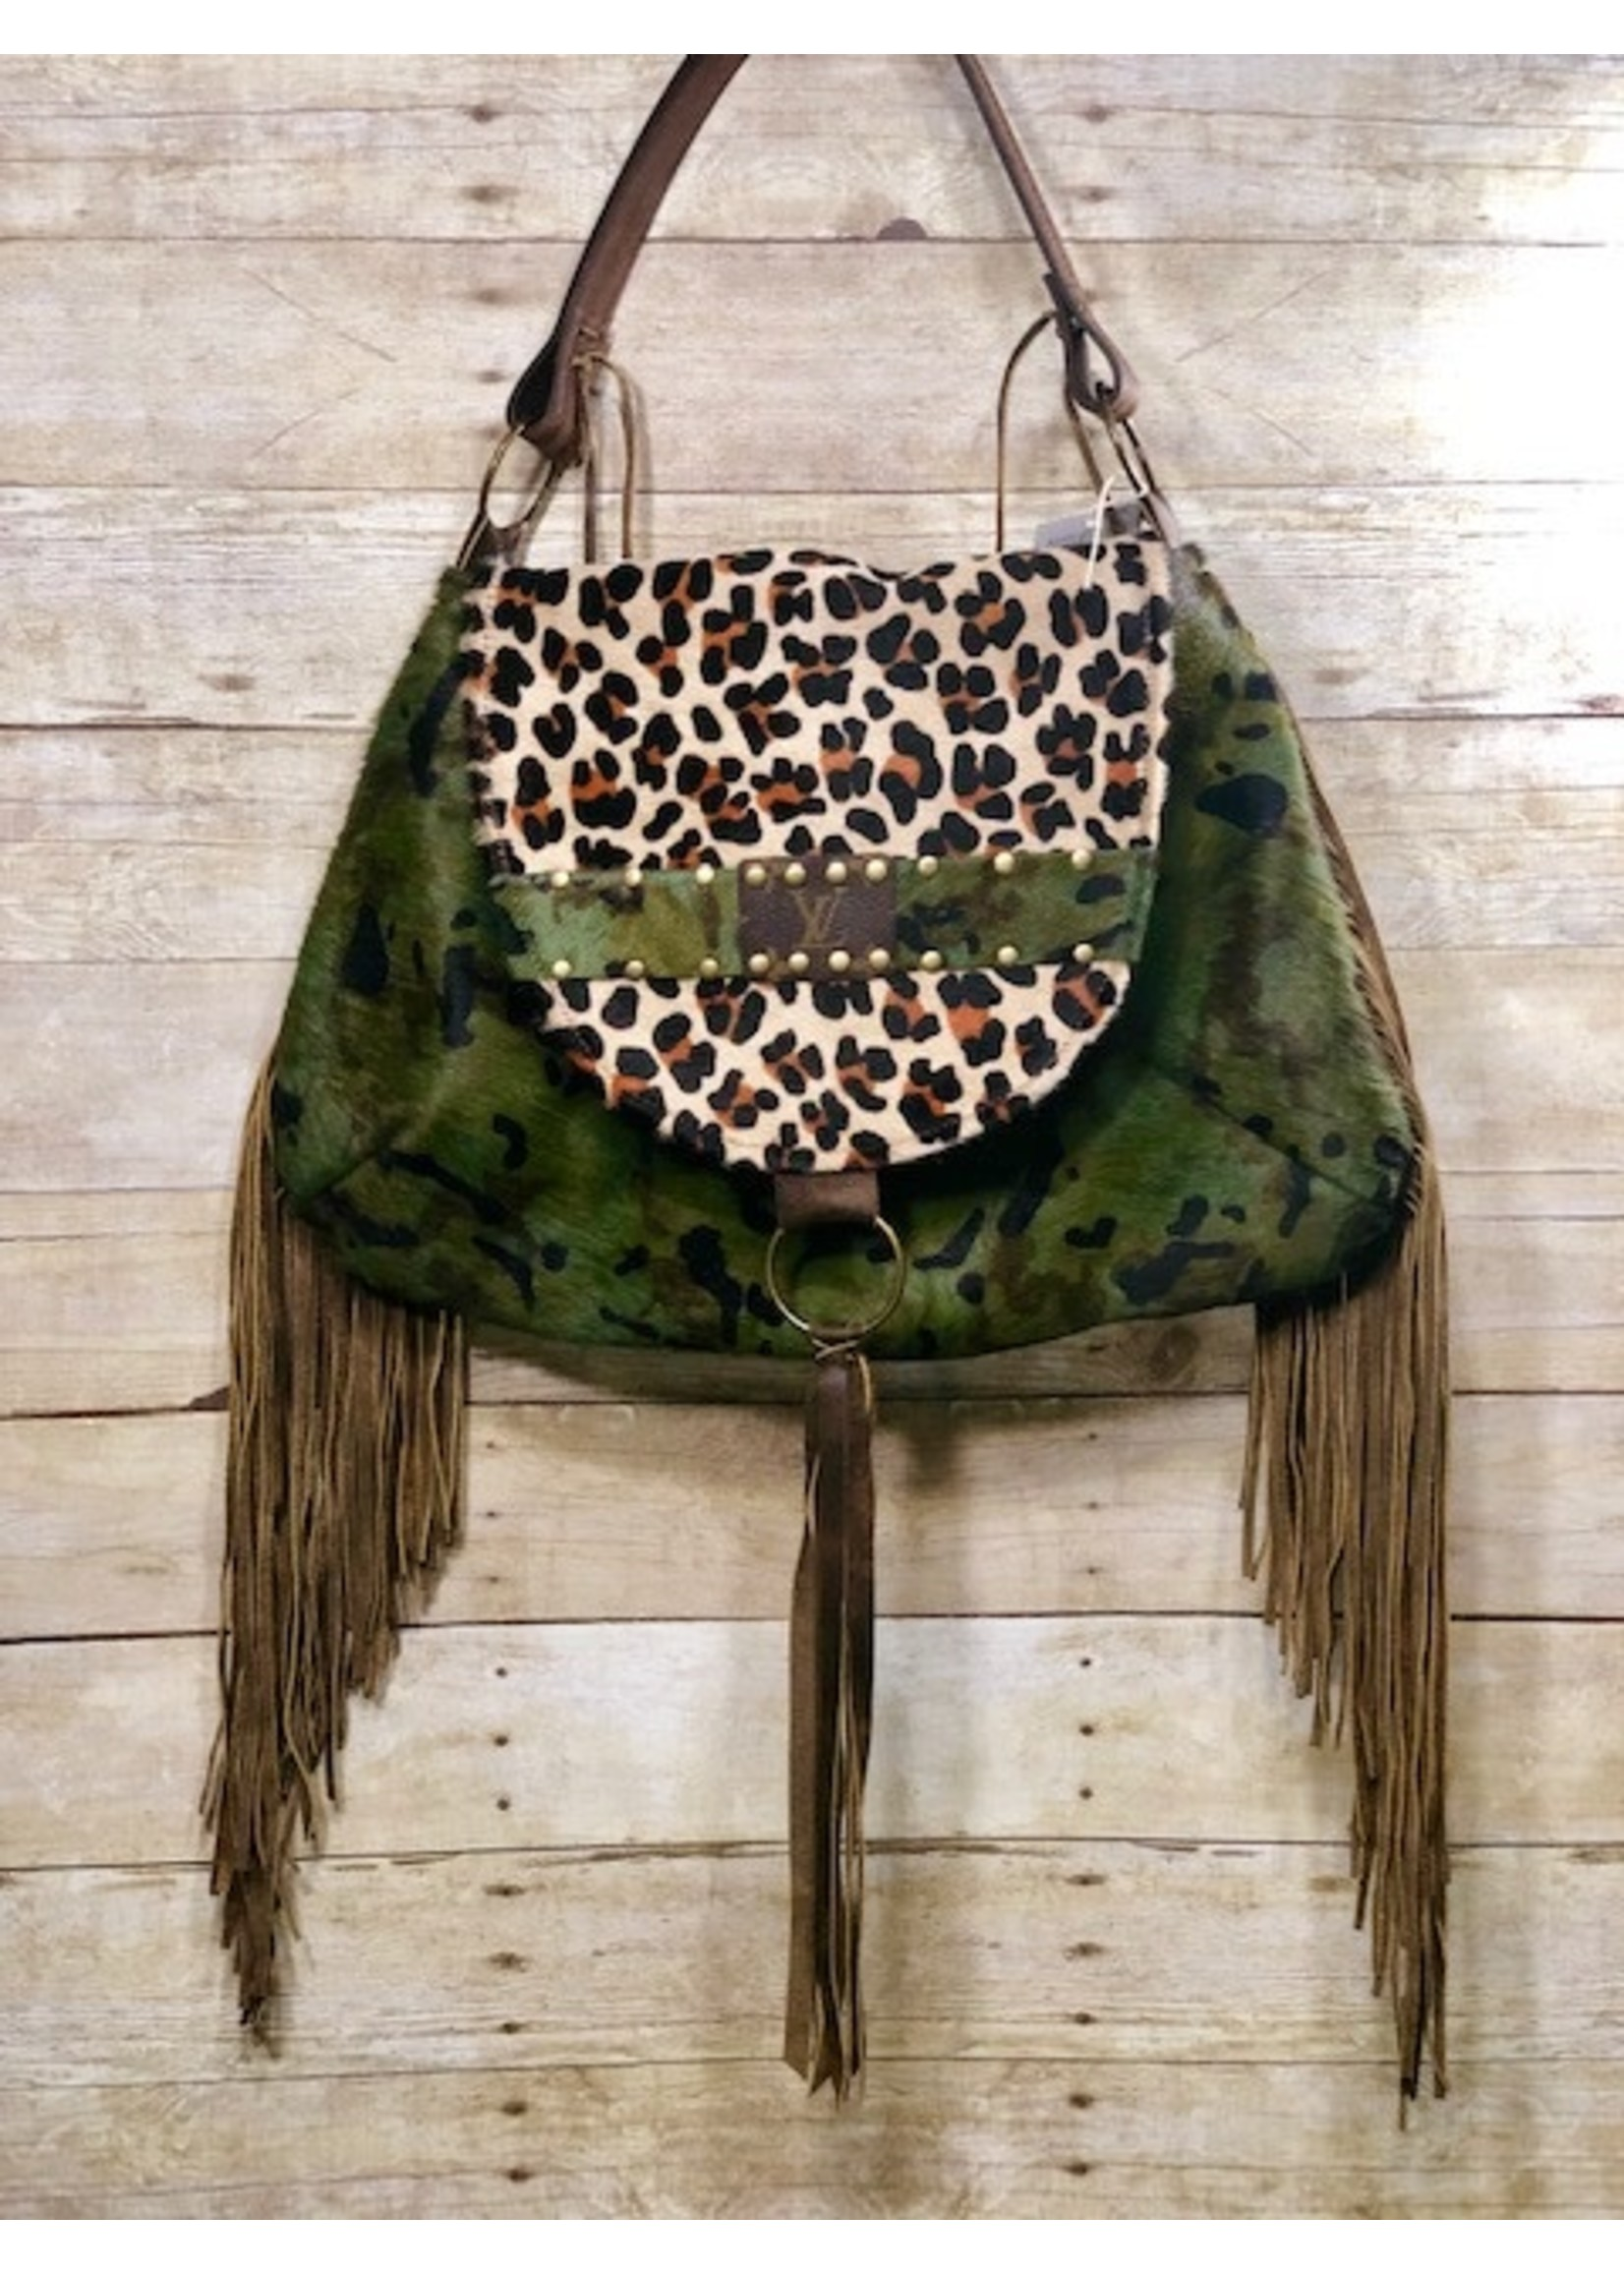 Leather LV Camo and Leopard Saddle Bag